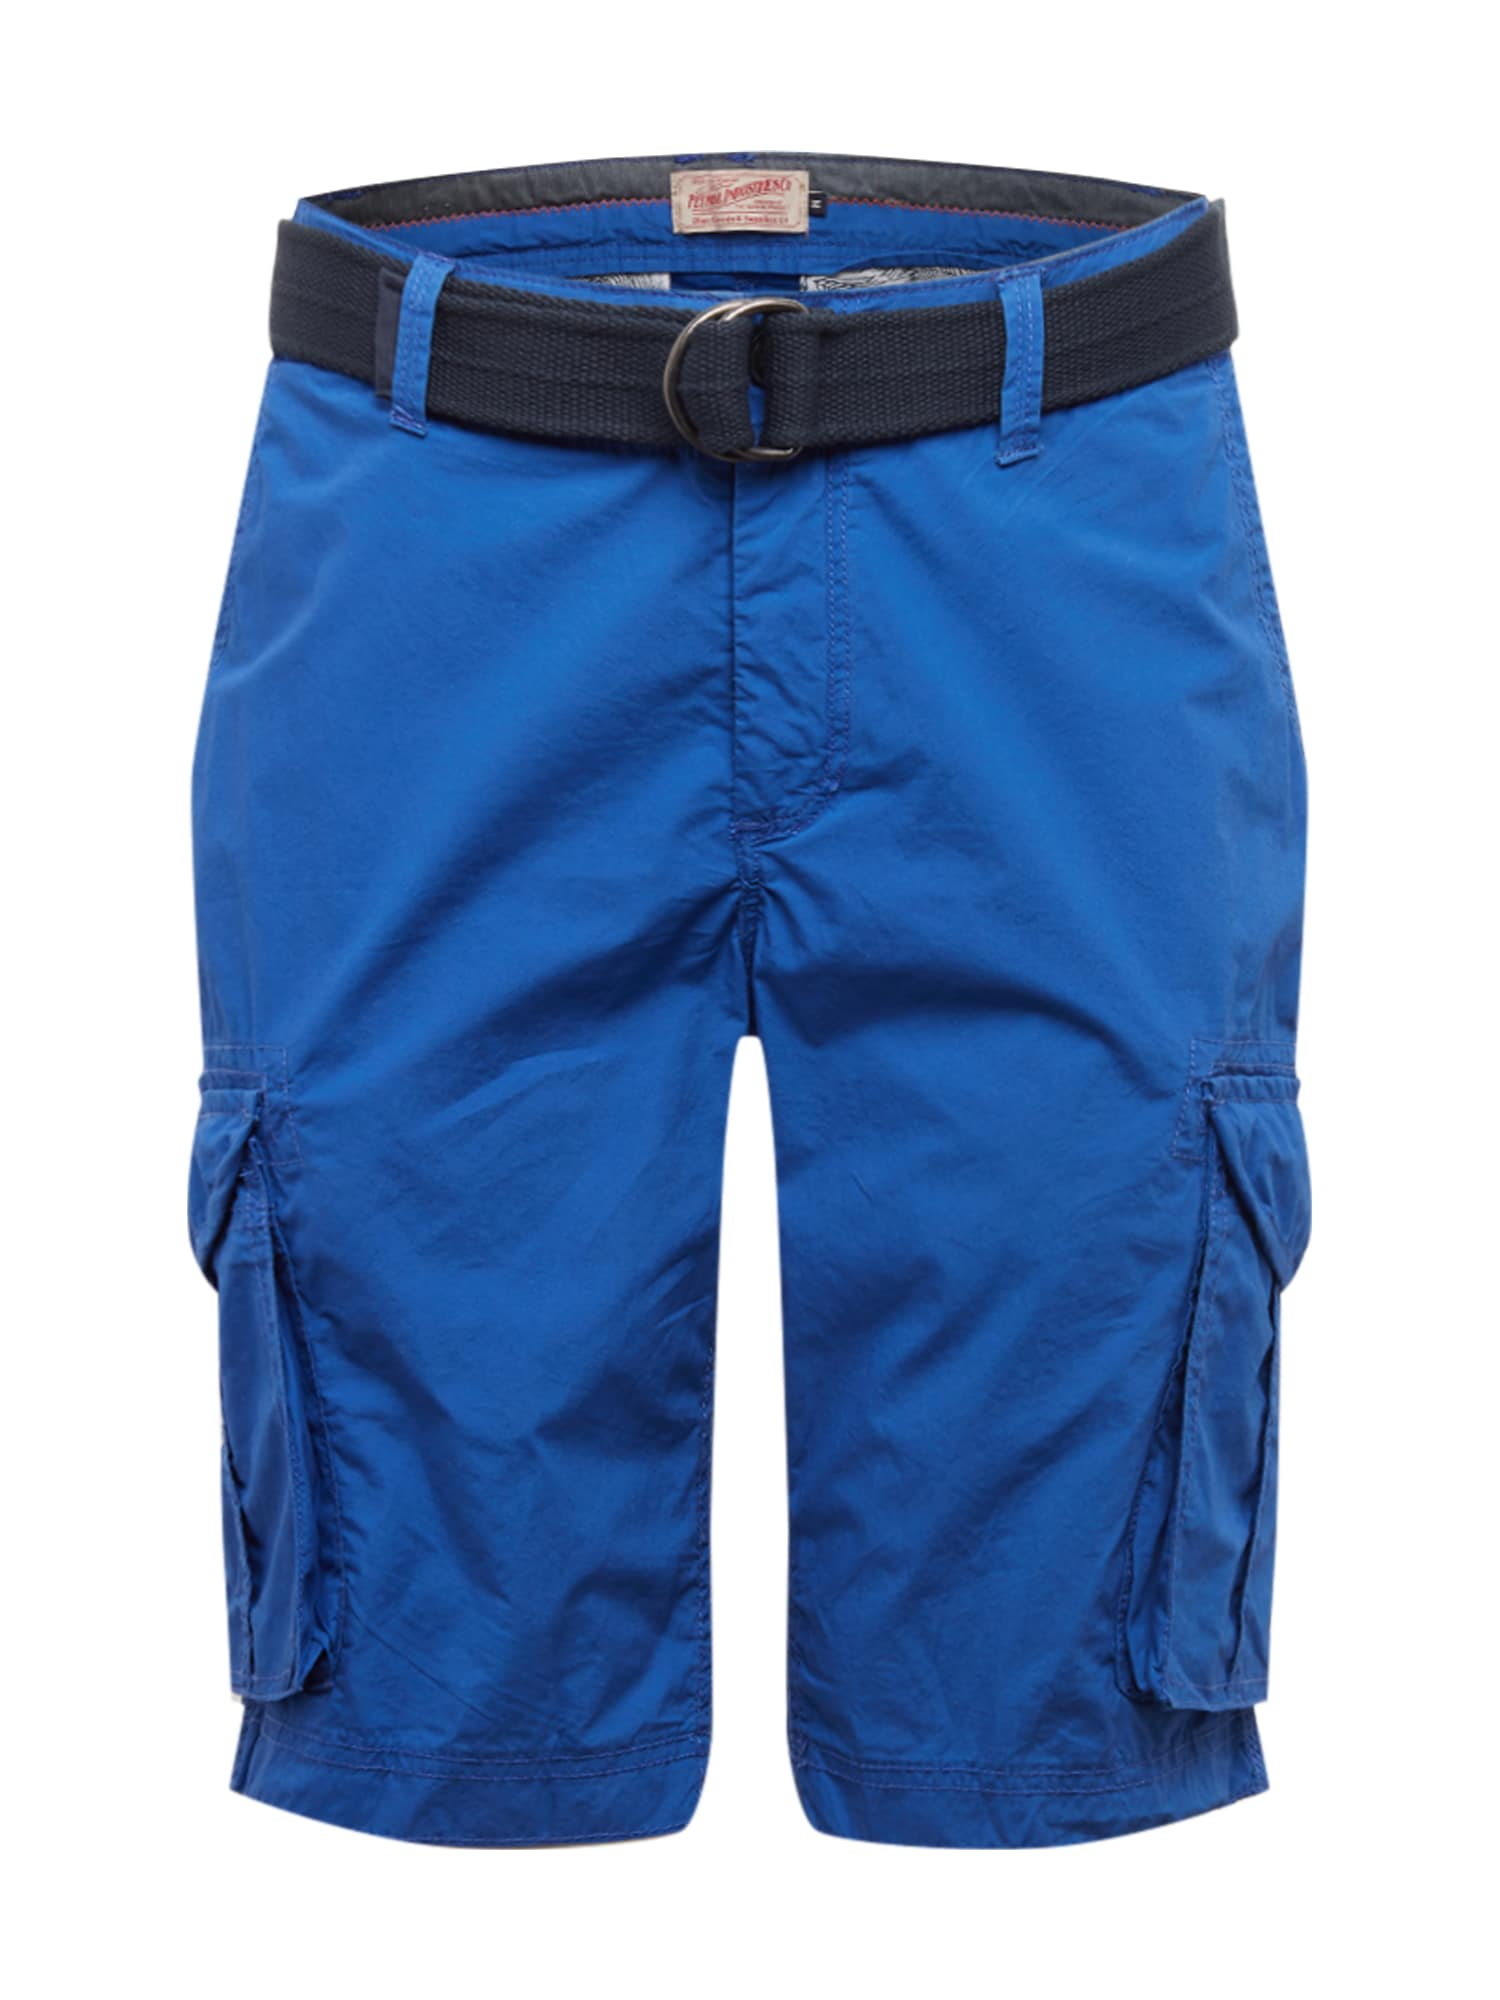 "Petrol Industries Laisvo stiliaus kelnės sodri mėlyna (""karališka"")"